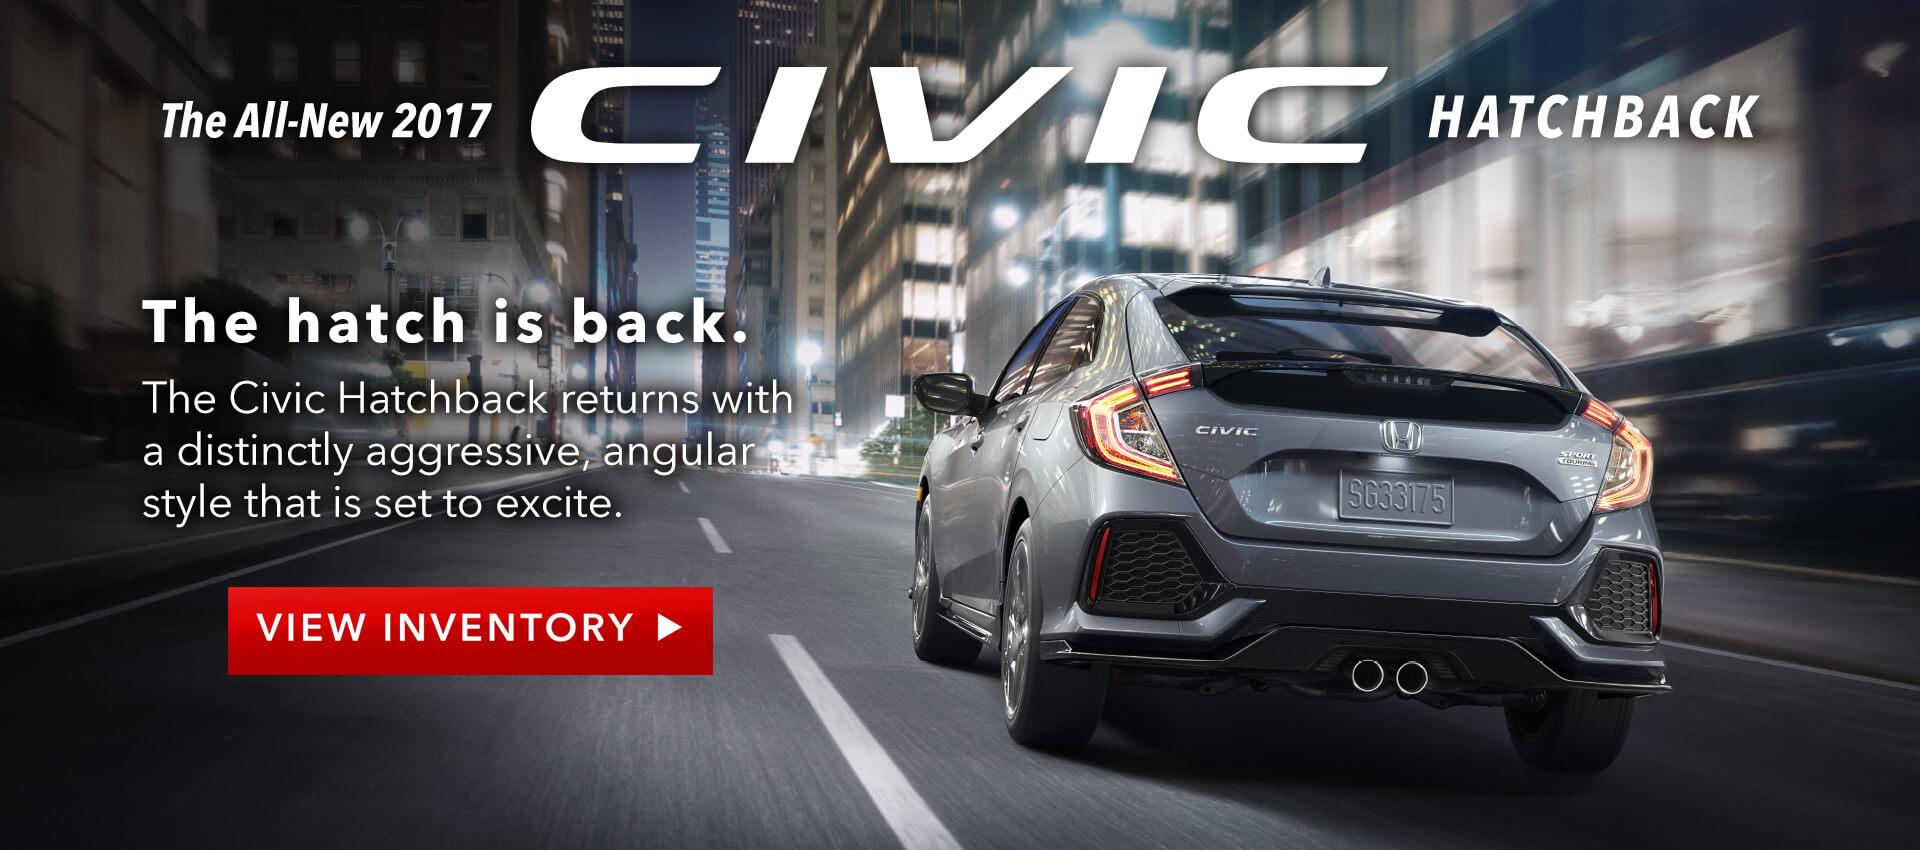 Civic Hatchback (Canned)